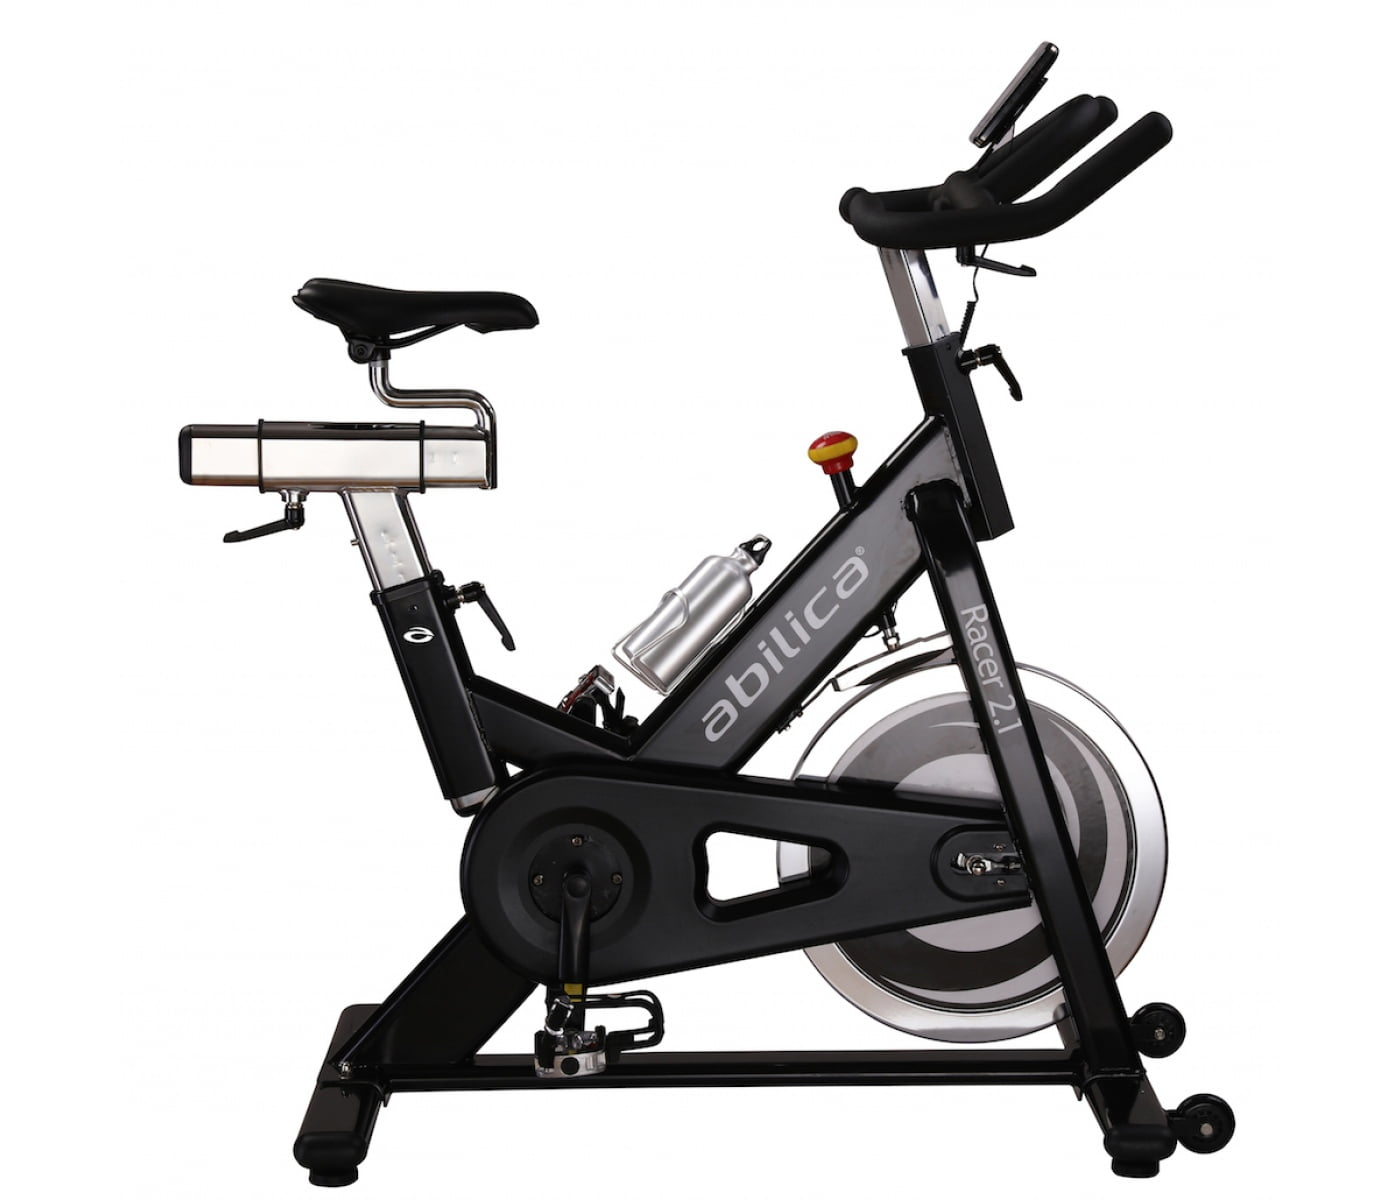 sort spinningscykel